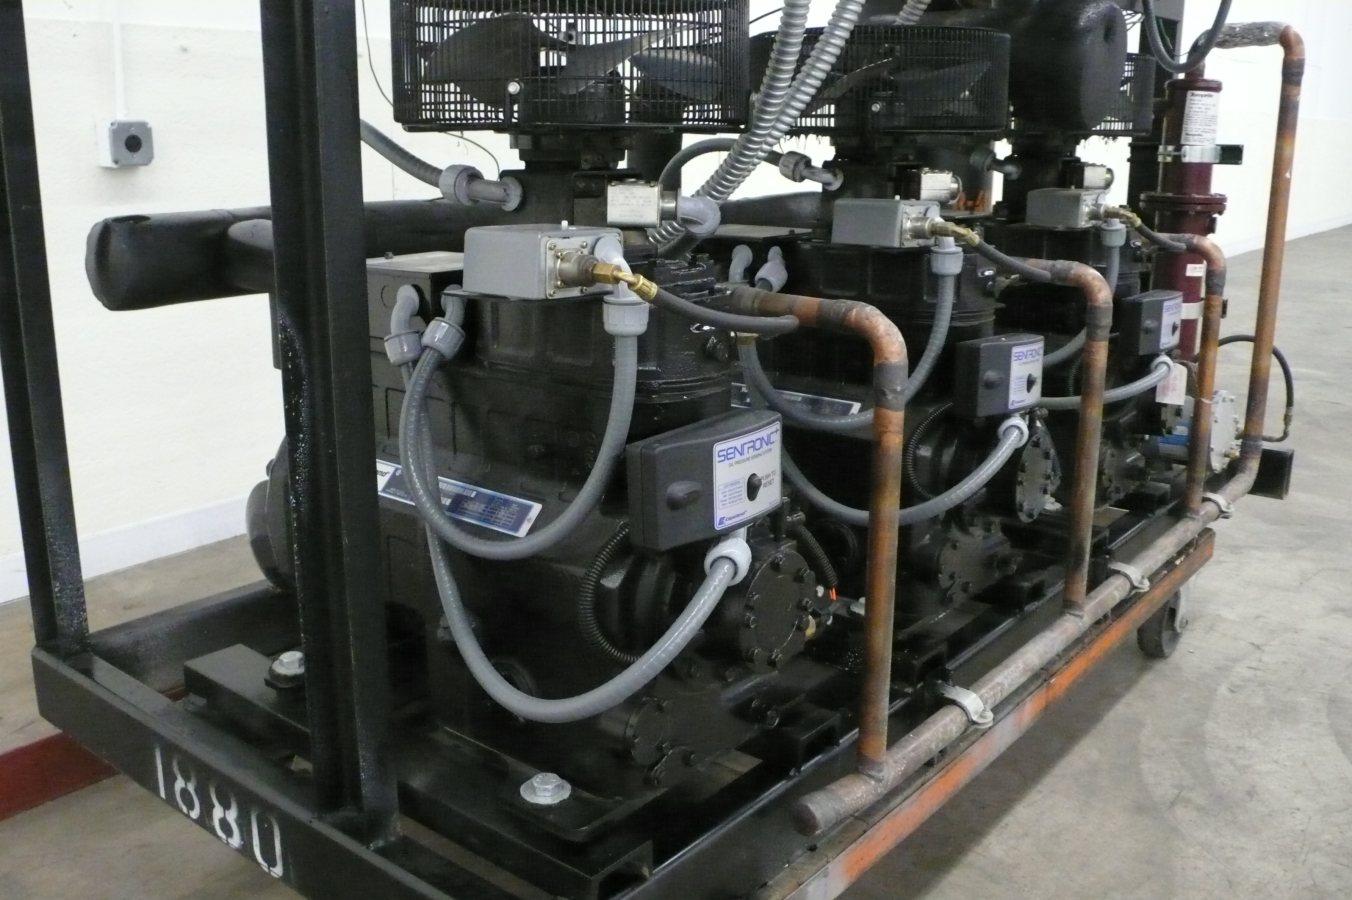 copeland discus wiring diagram ford cortina mk2 zero zone 22 5 hp low temp freezer refrigeration rack